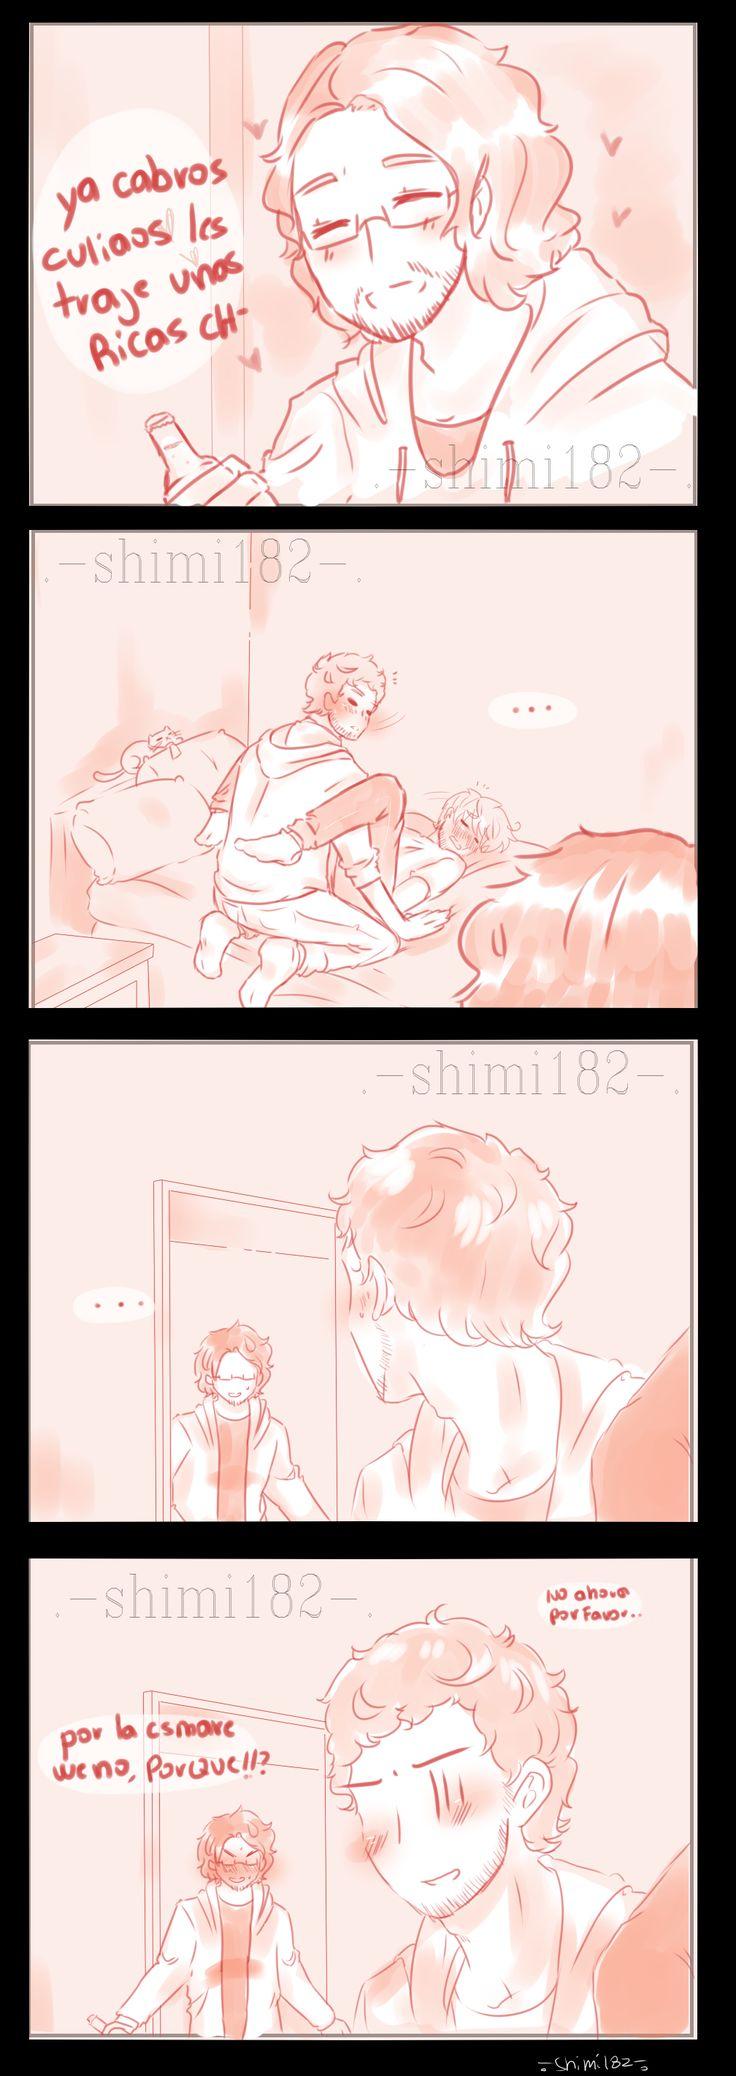 Momento incómodo - Jainico [GOTH] | by Shimi182